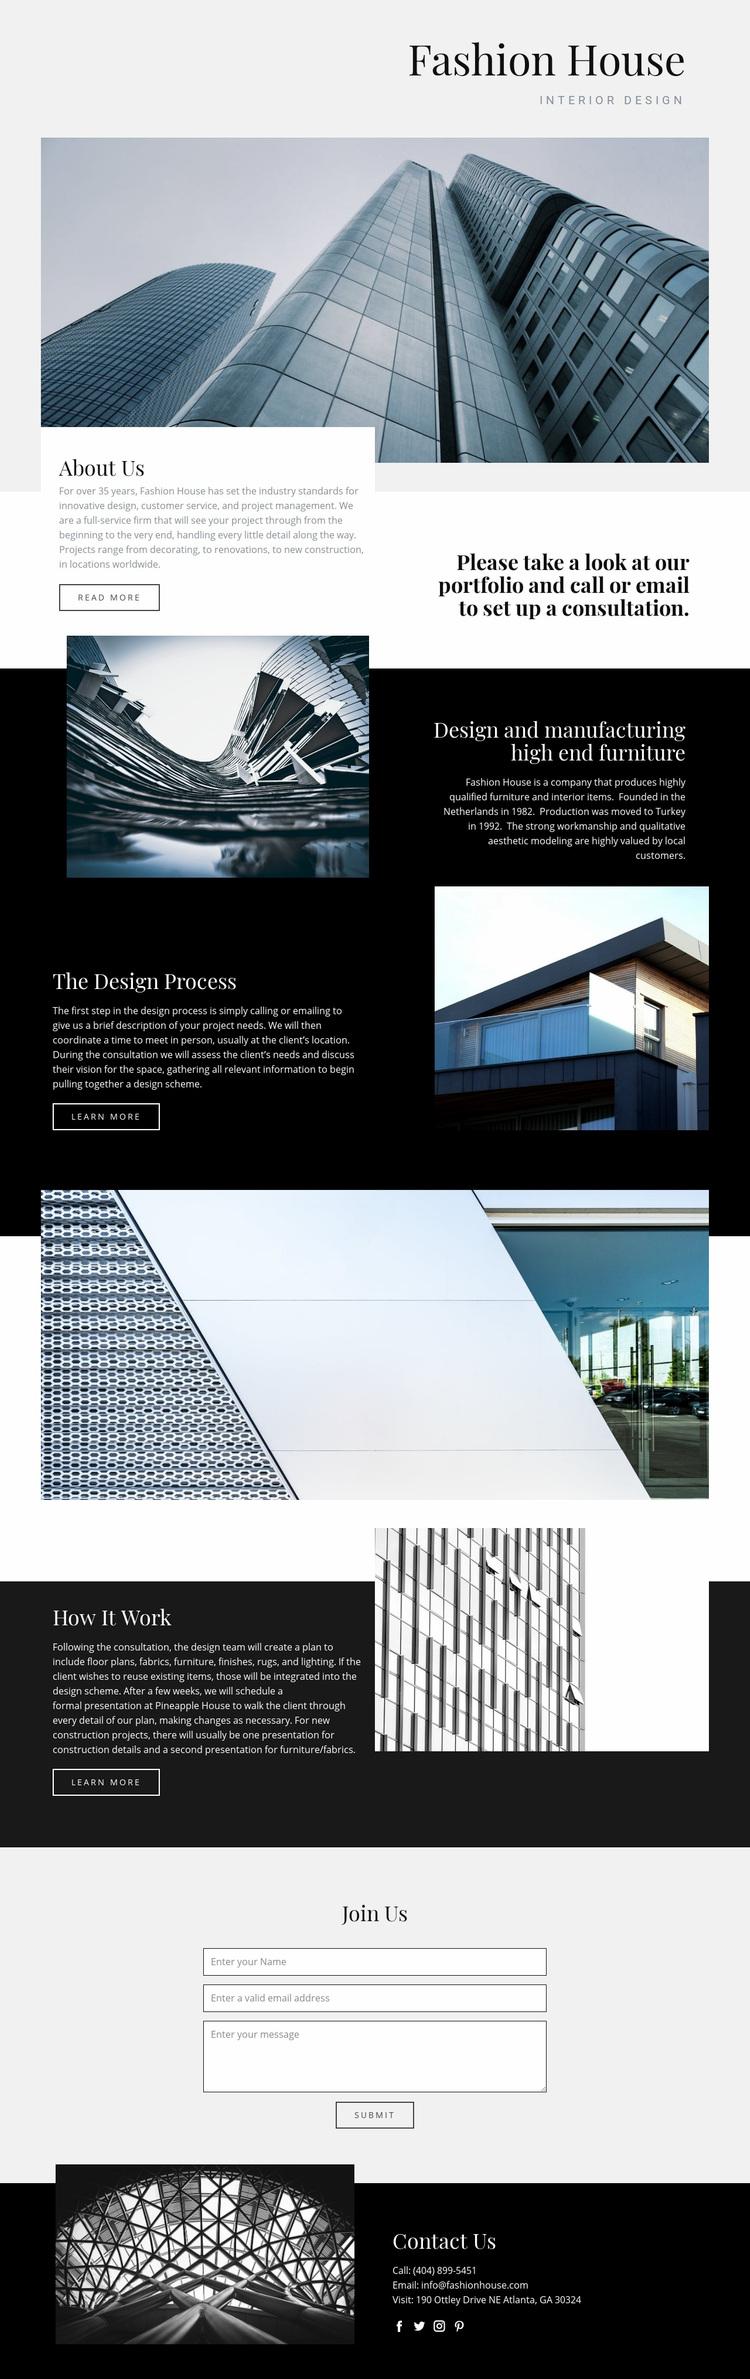 Fashion House Web Page Designer